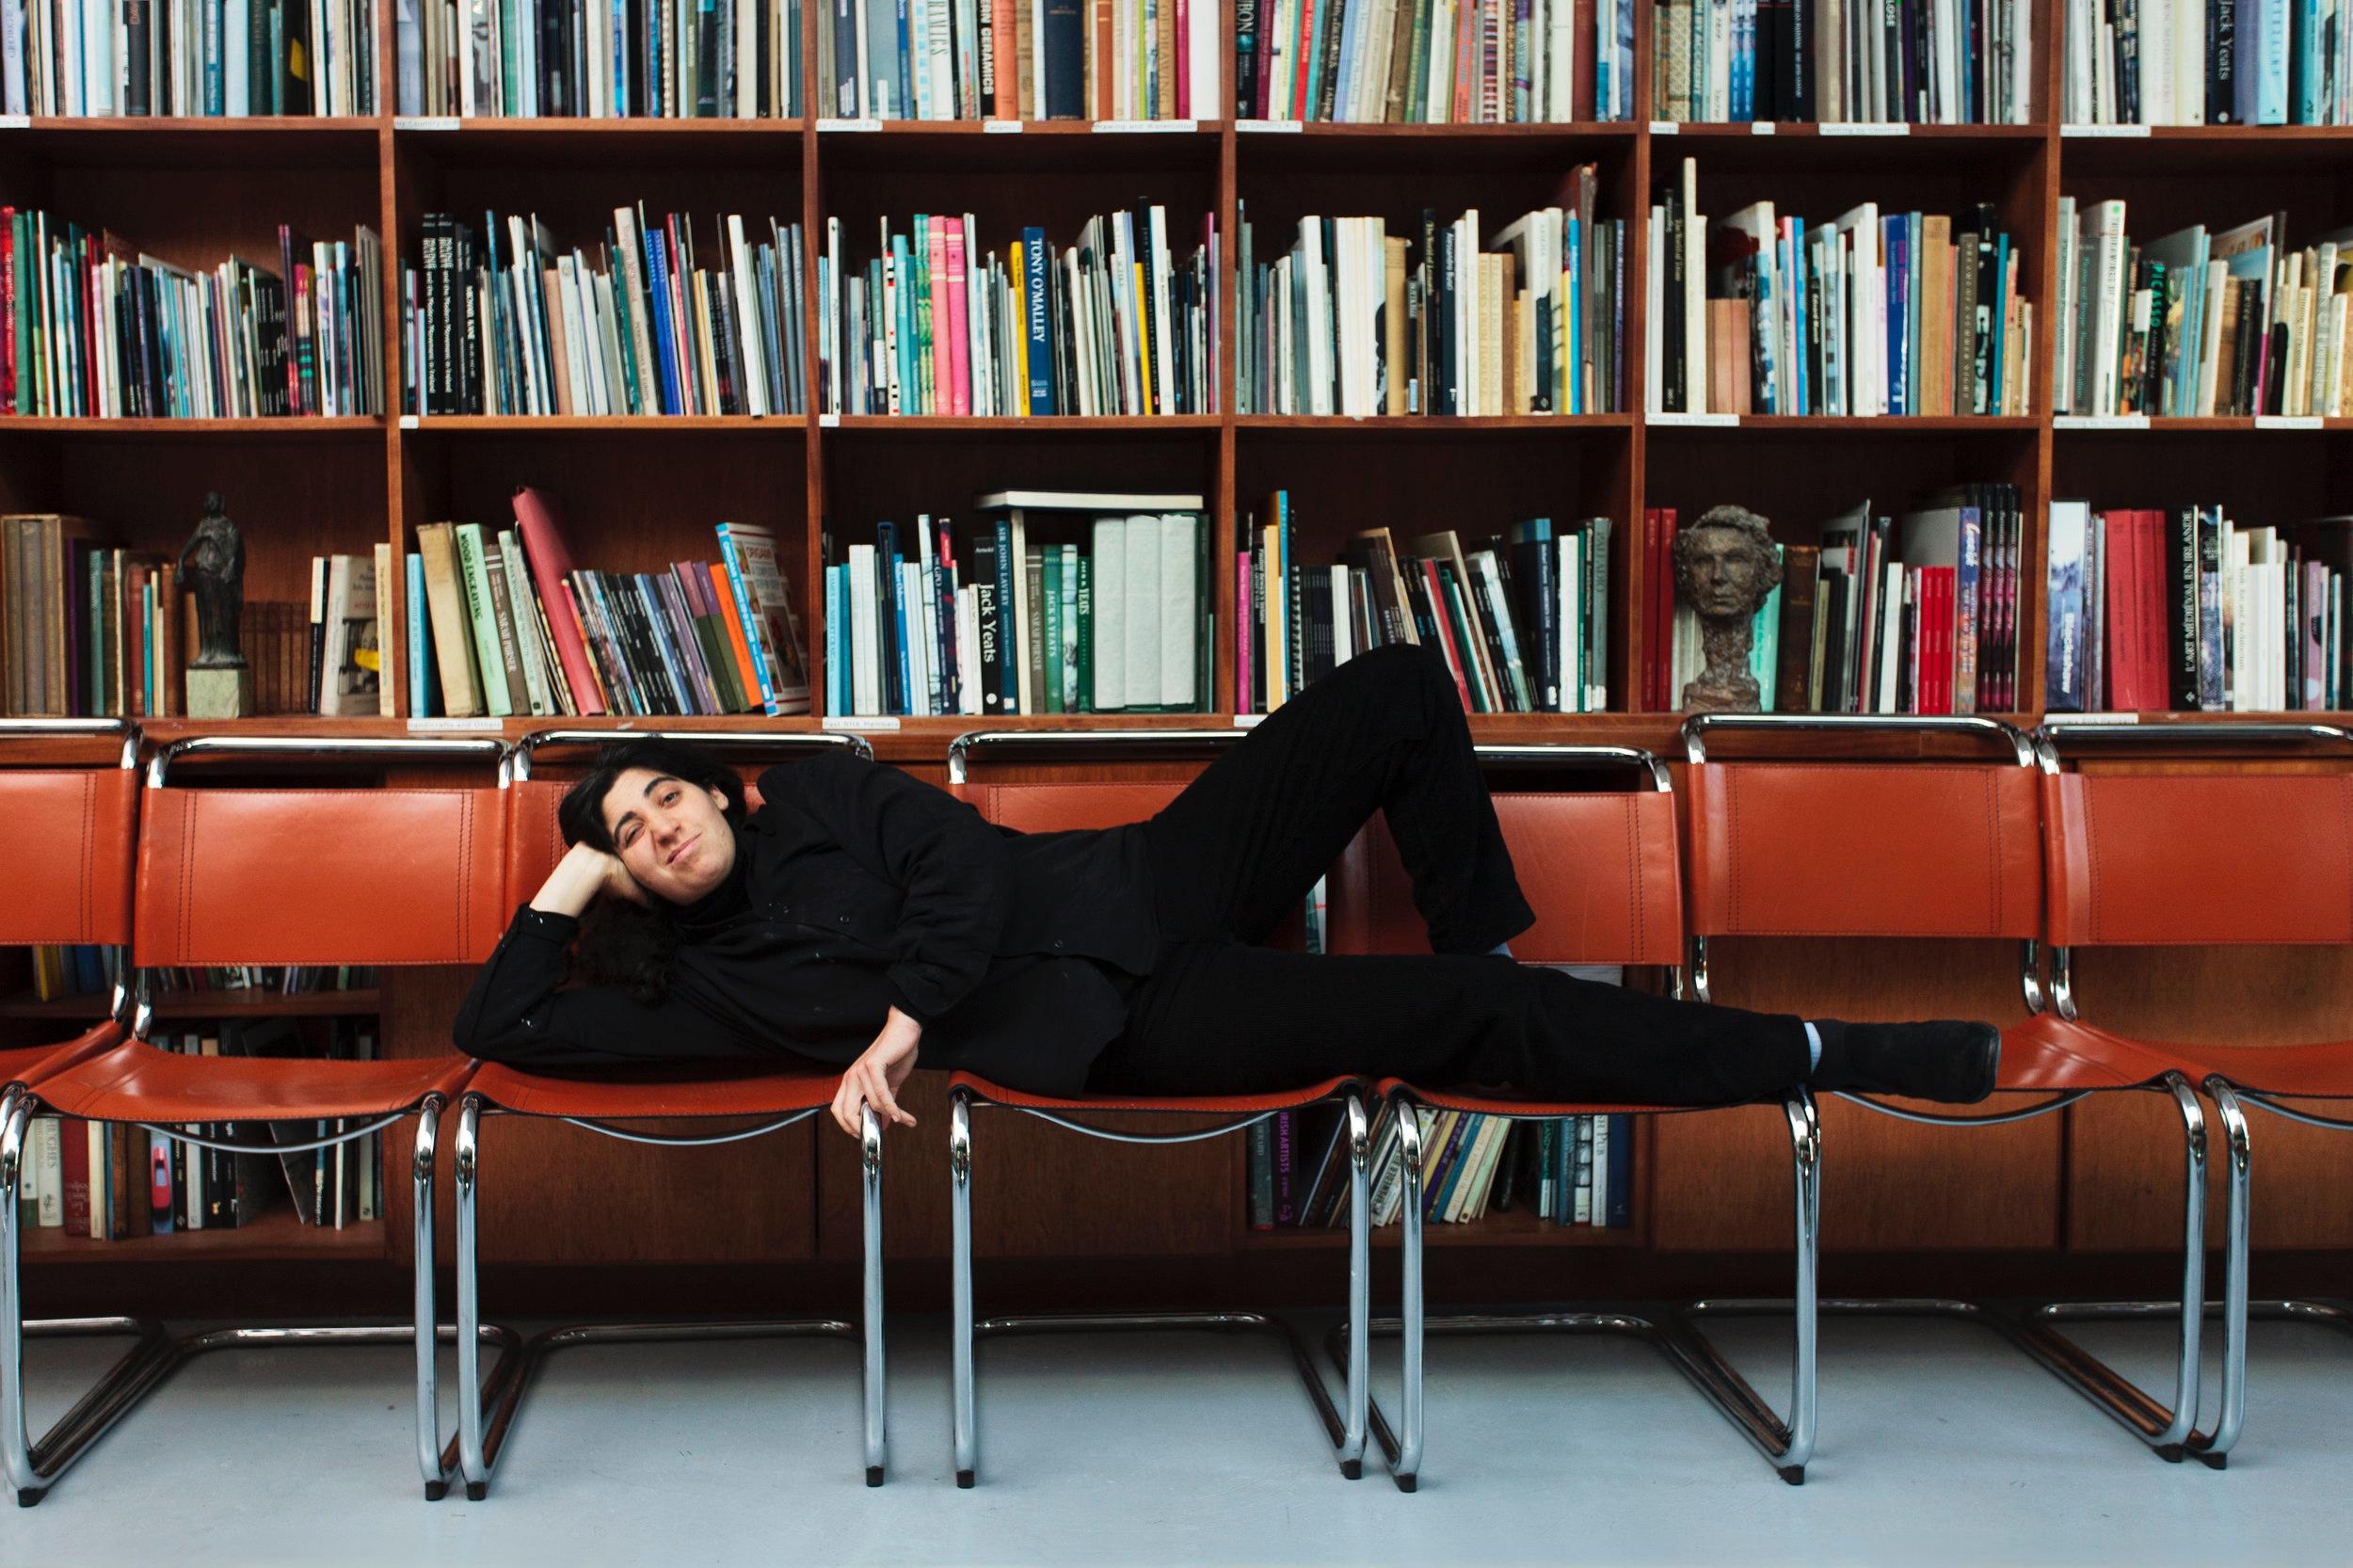 Isadora+Epstein%2C+%27The+Studio+Visit%27%2C+photo_+C%C3%A1it+Fahey.jpg